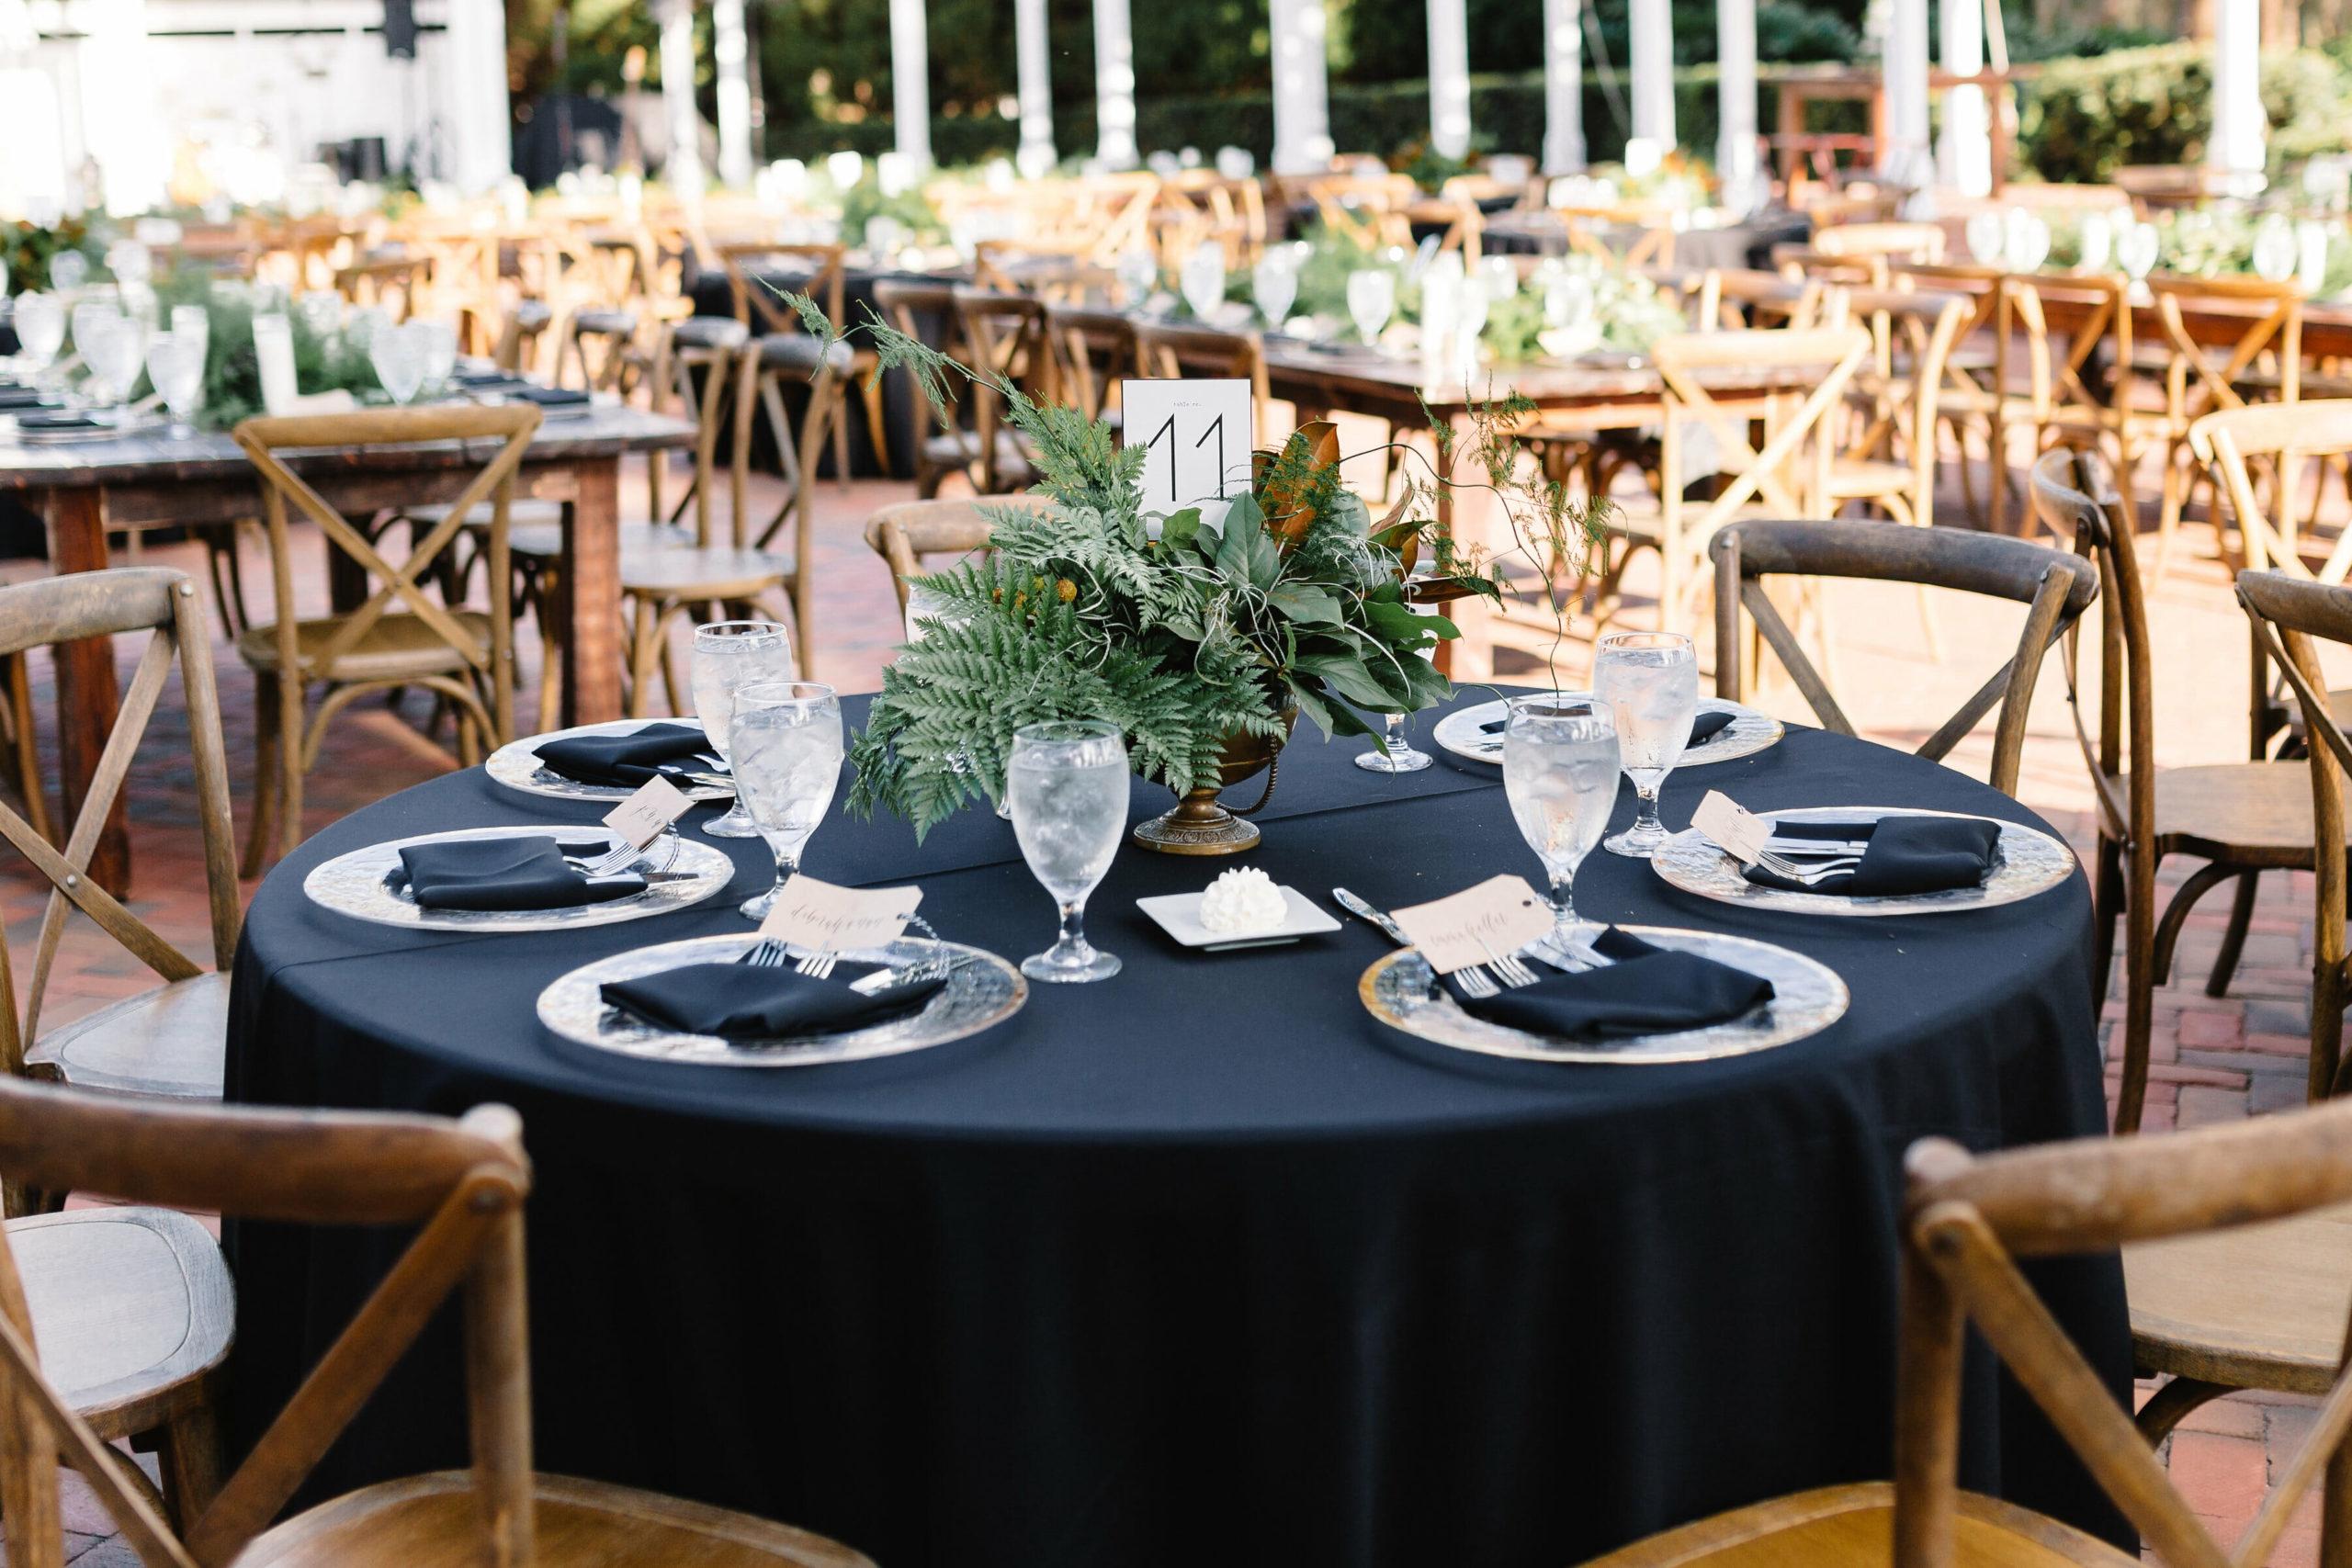 cypess_grove_estate_house_wedding_outdoor_orlando_wedding_venue (13)